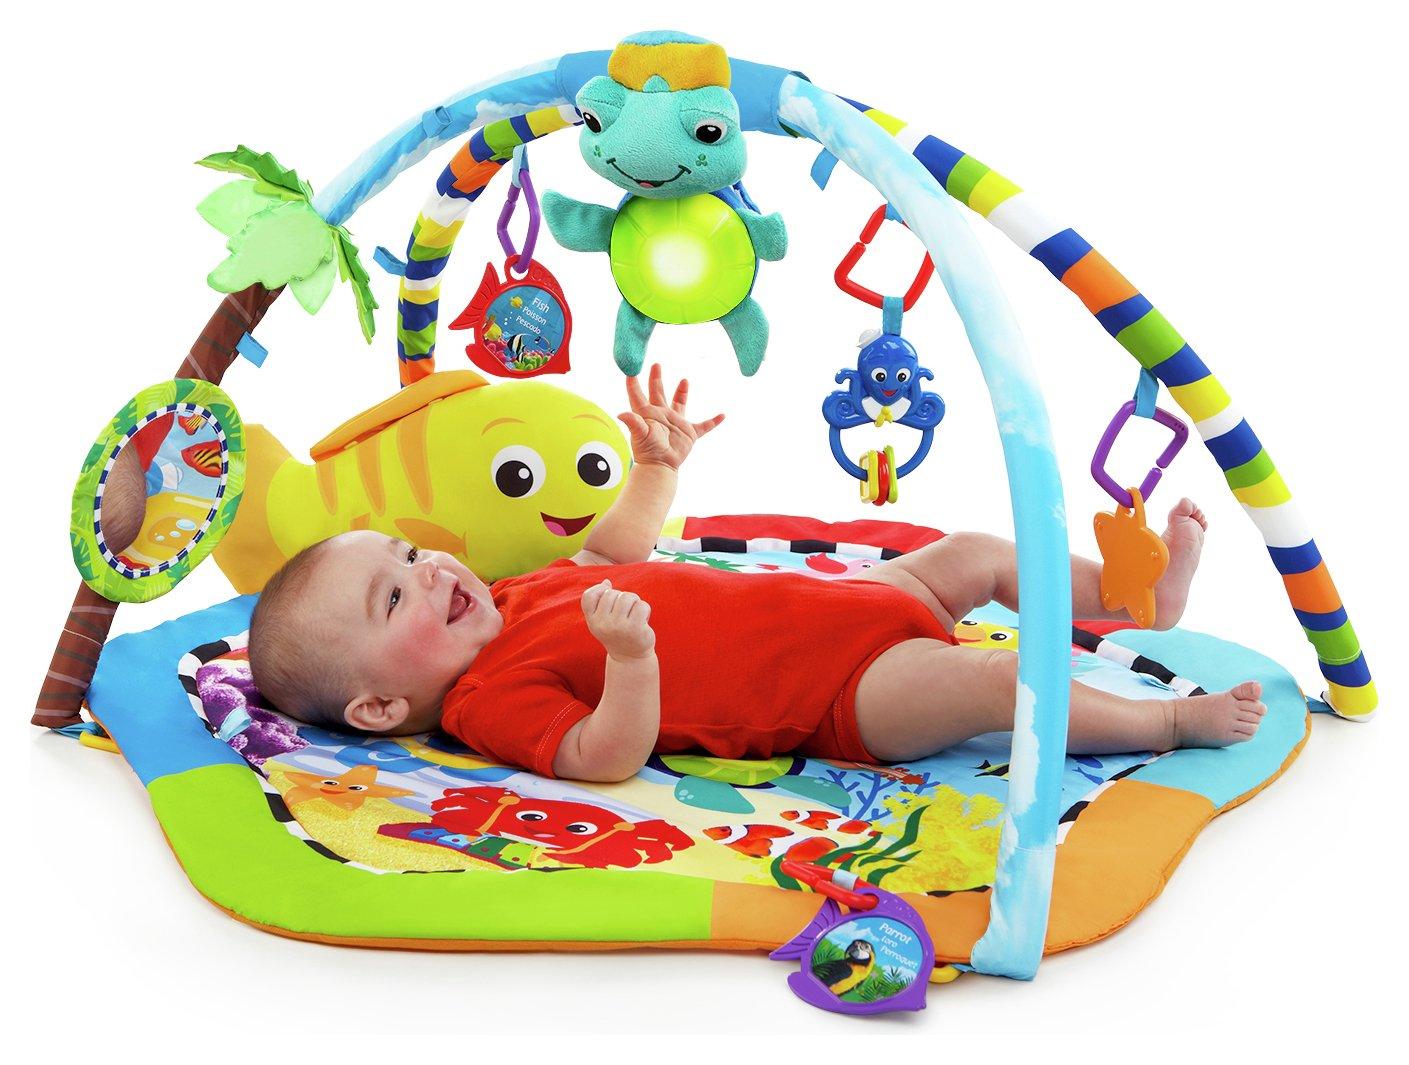 Image of Baby Einstein - Rythm Reef Play Gym